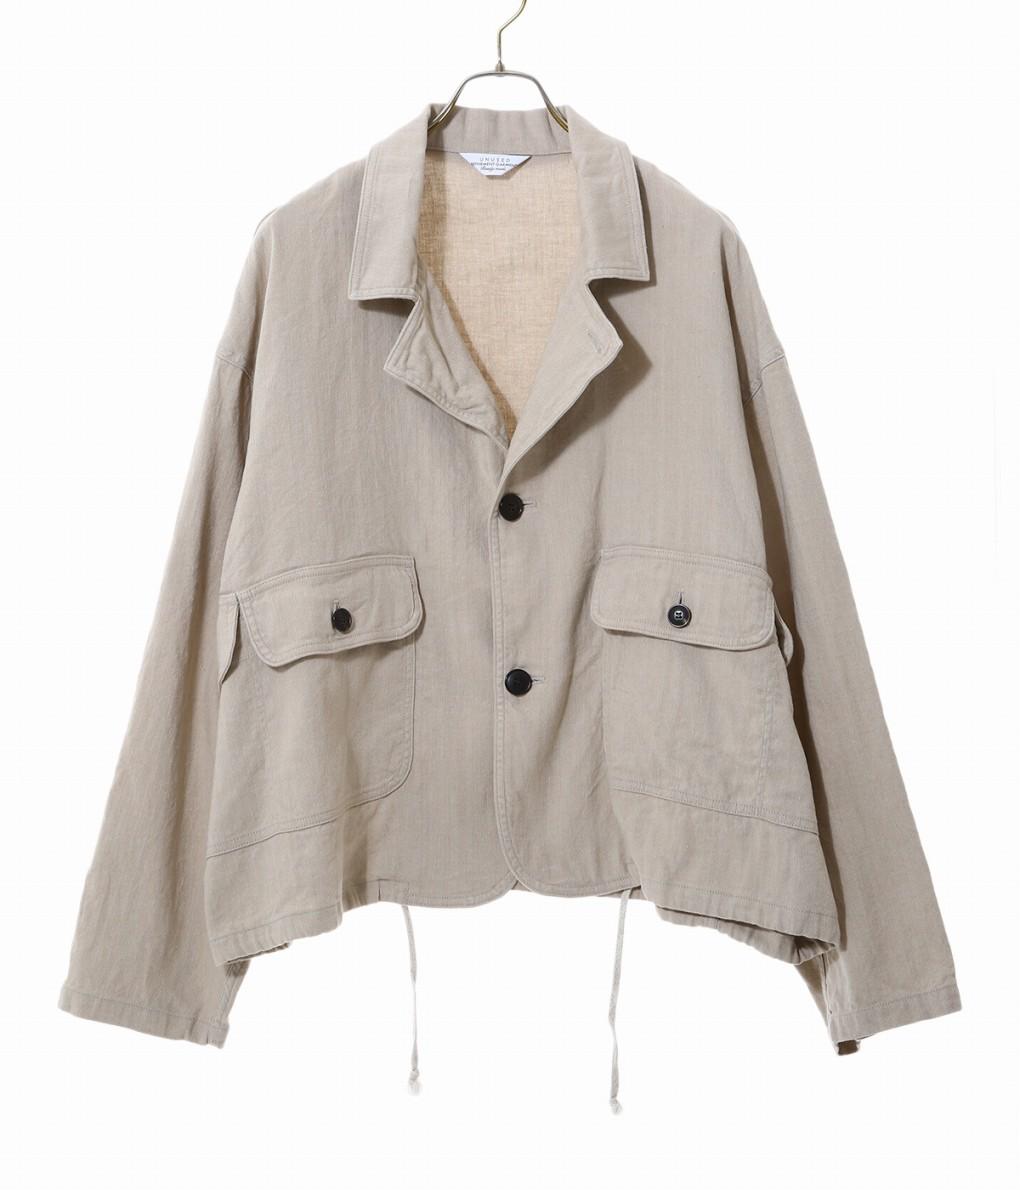 UNUSED / アンユーズド : Work jacket : ワークジャケット ジャケット メンズ : US1558 【NOA】